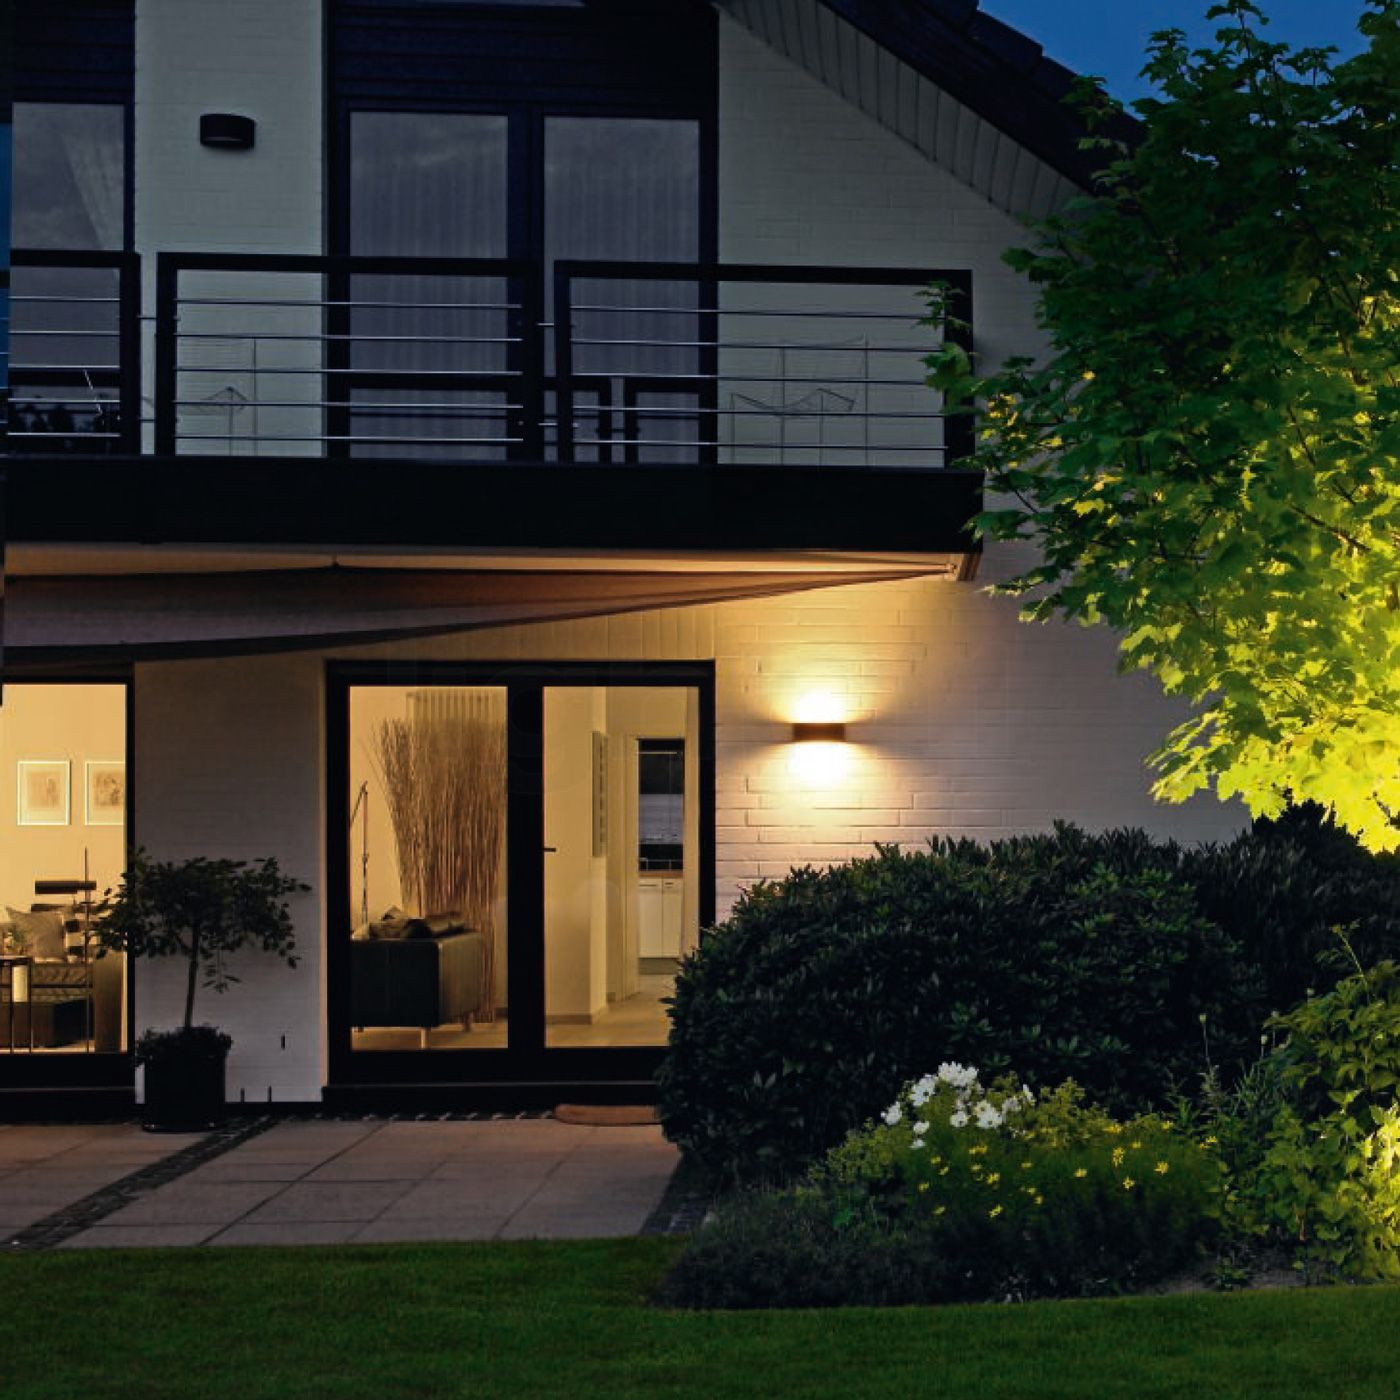 Bega Menden bega 33325 wall light led wall mounted light light11 eu